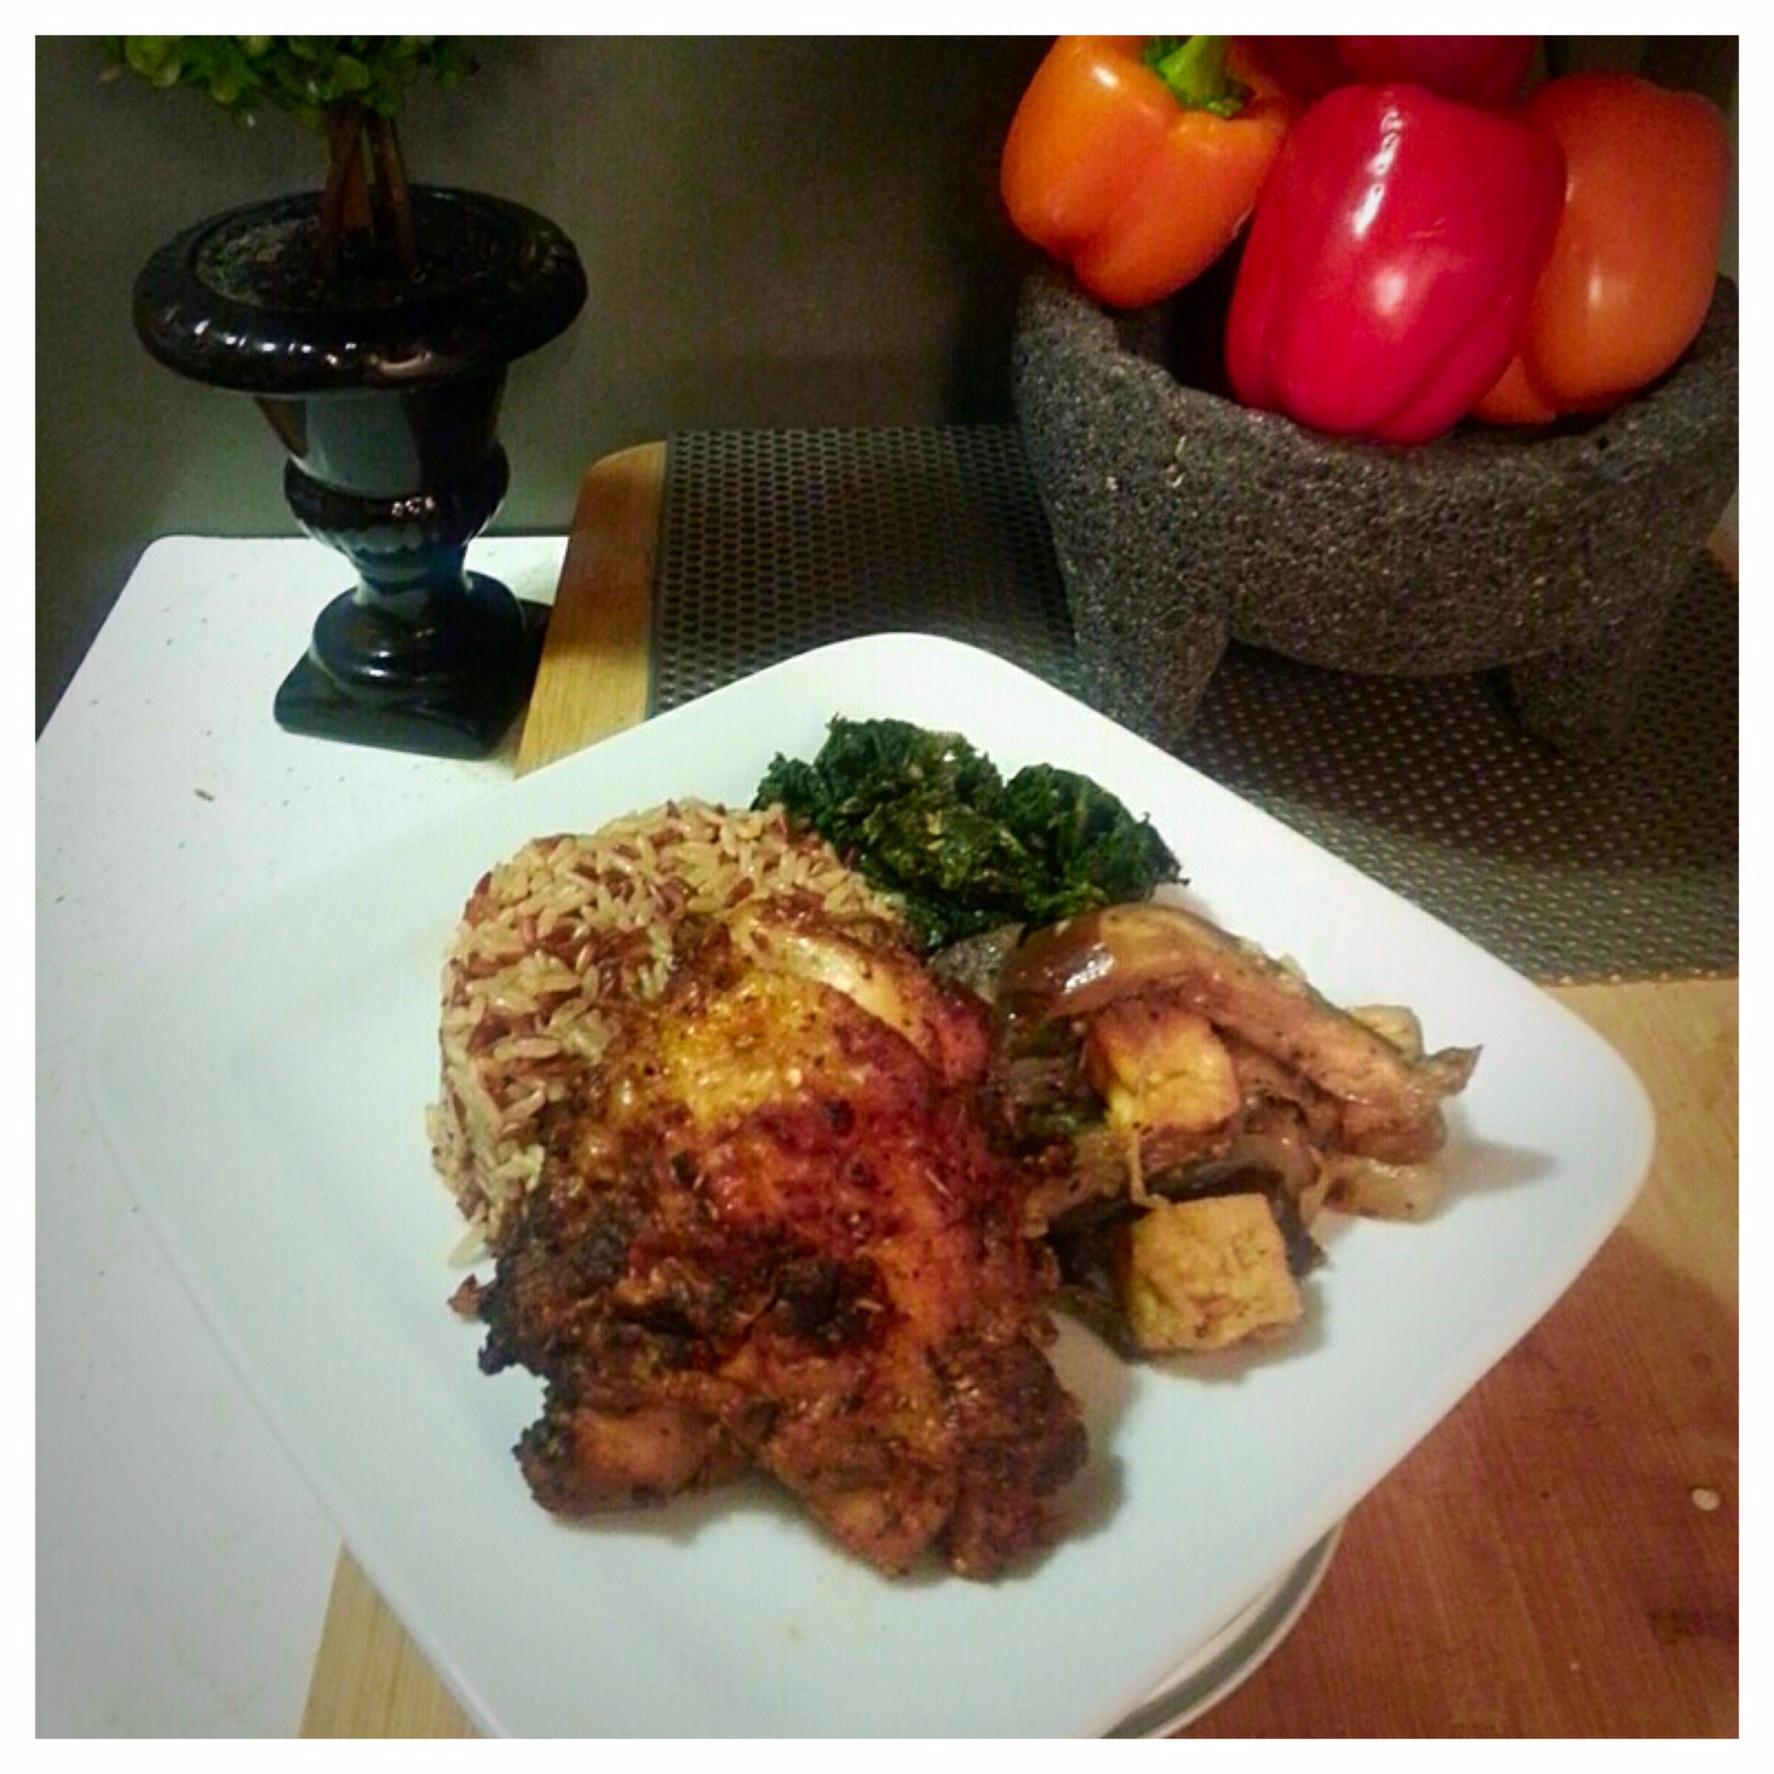 Roasted Chicken with Sautéed Kale and Eggplant Tofu Stir Fry